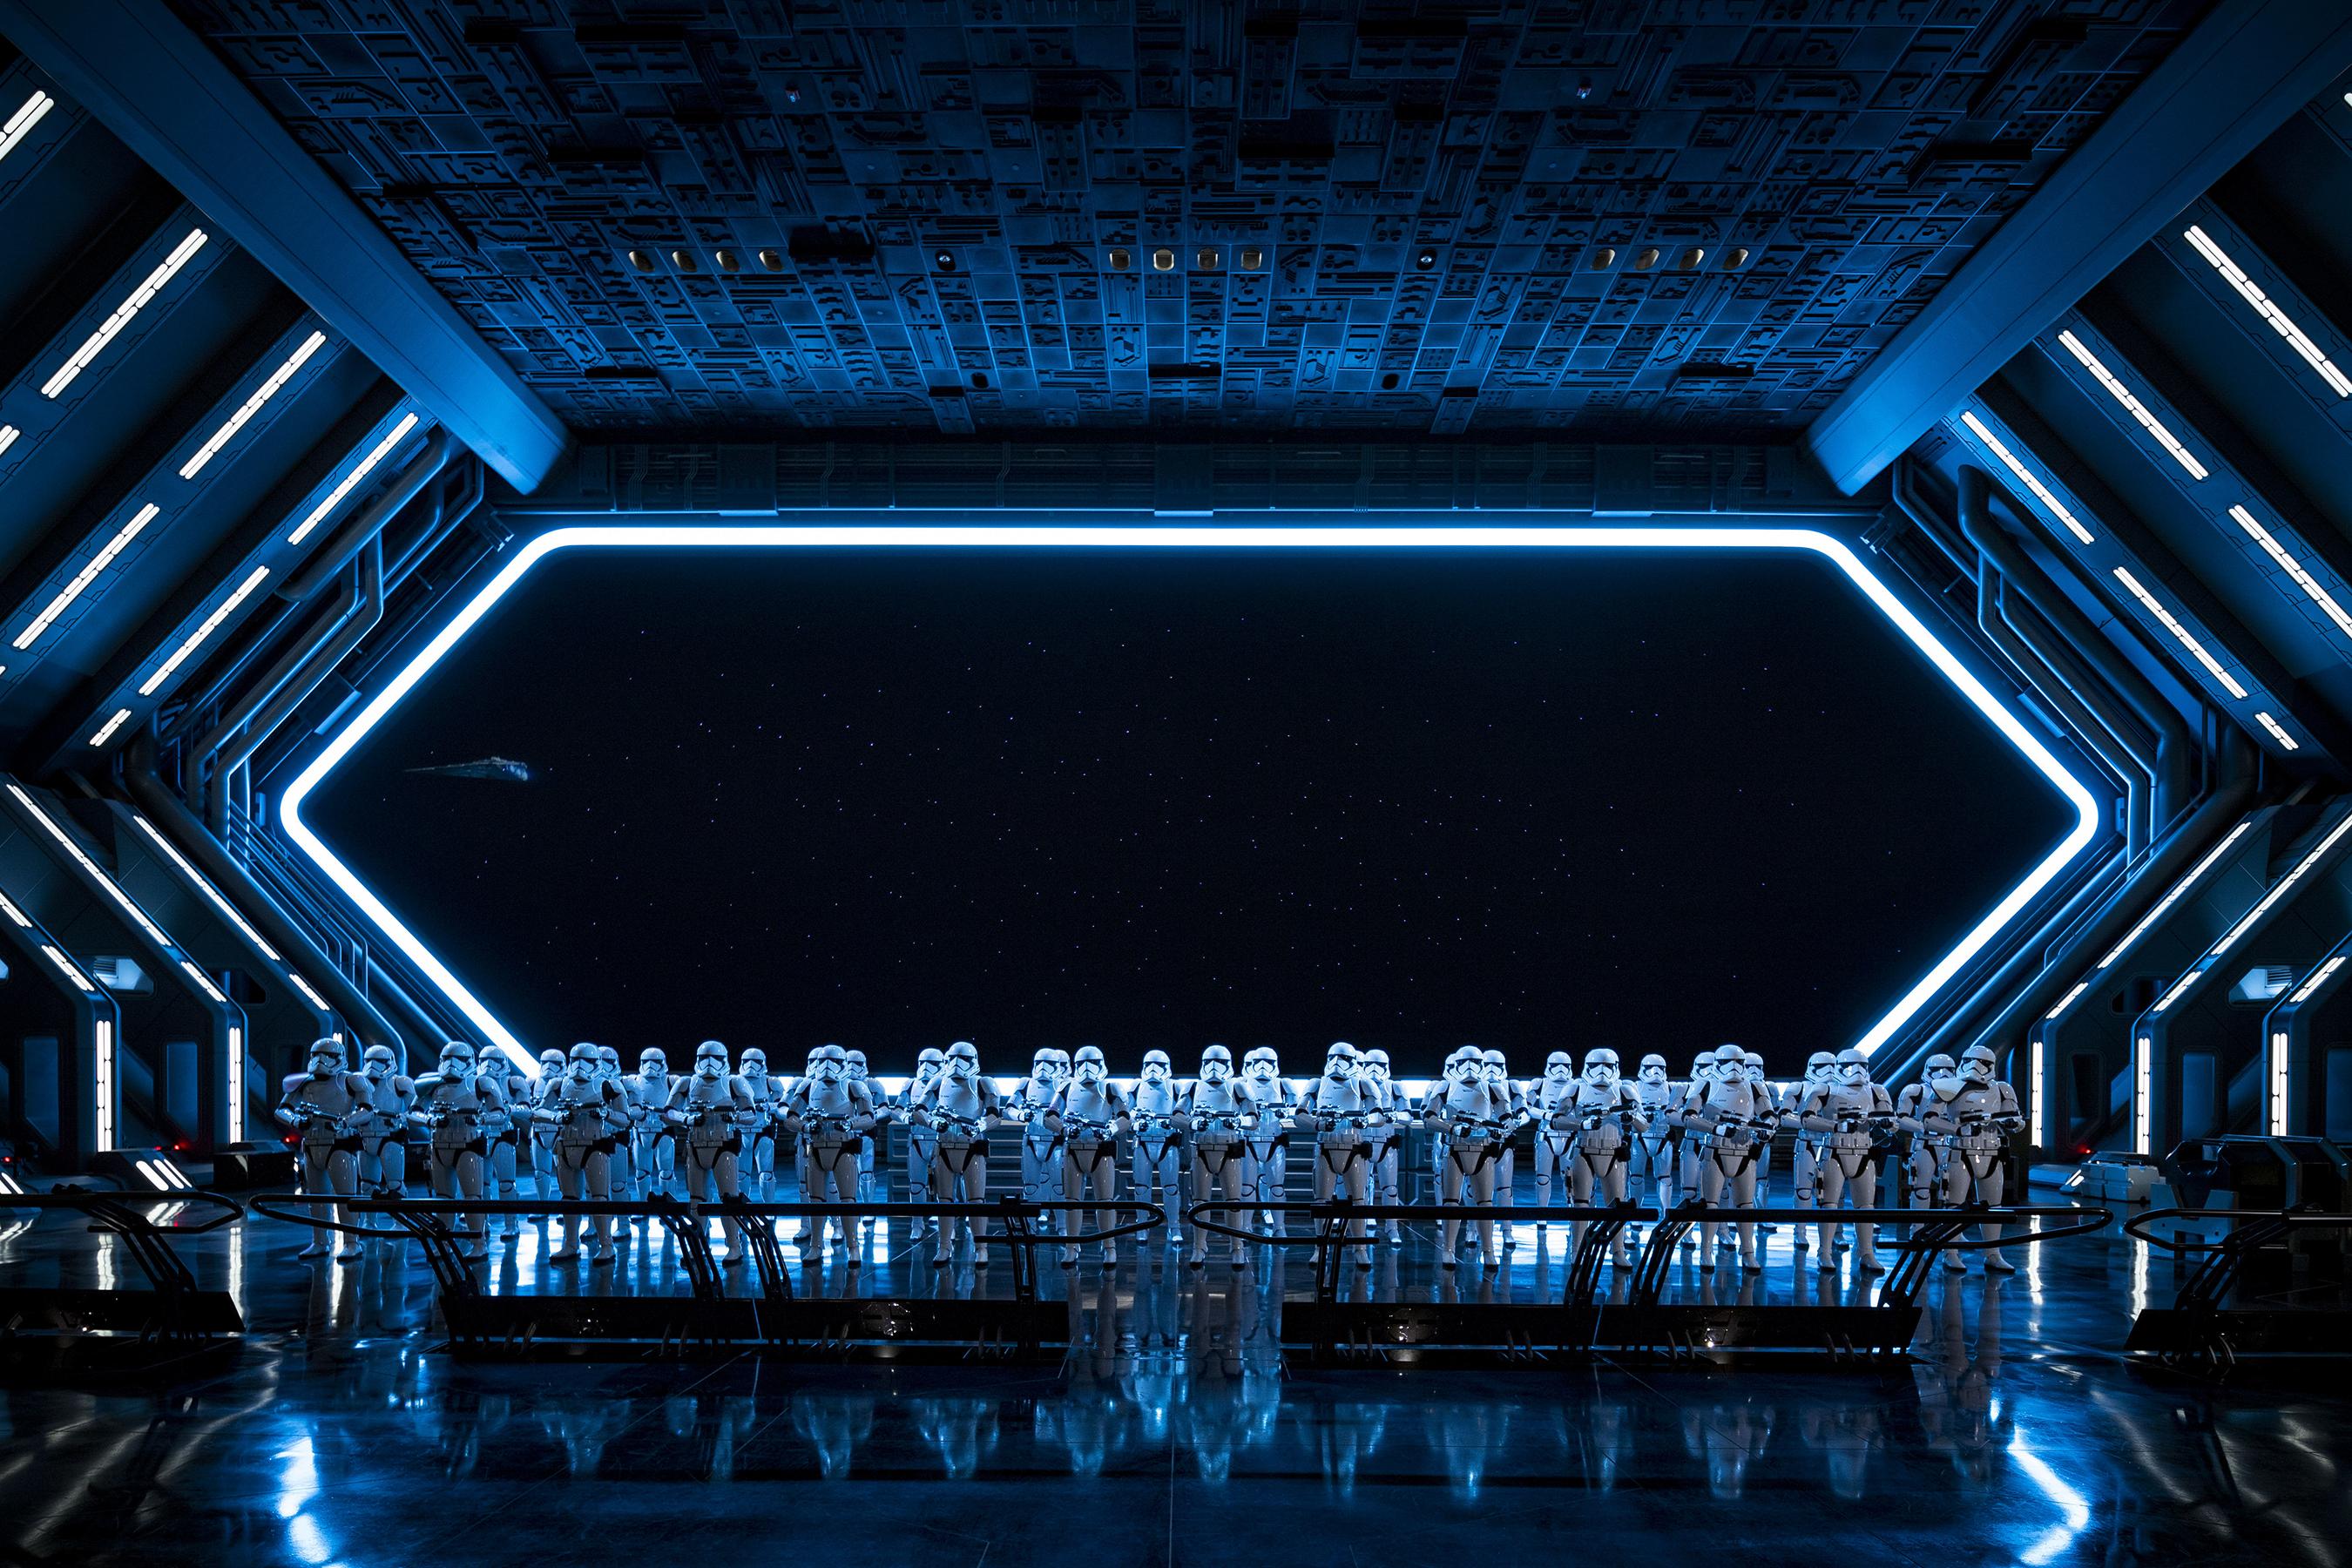 The massive hanger scene aboard the Star Destroyer